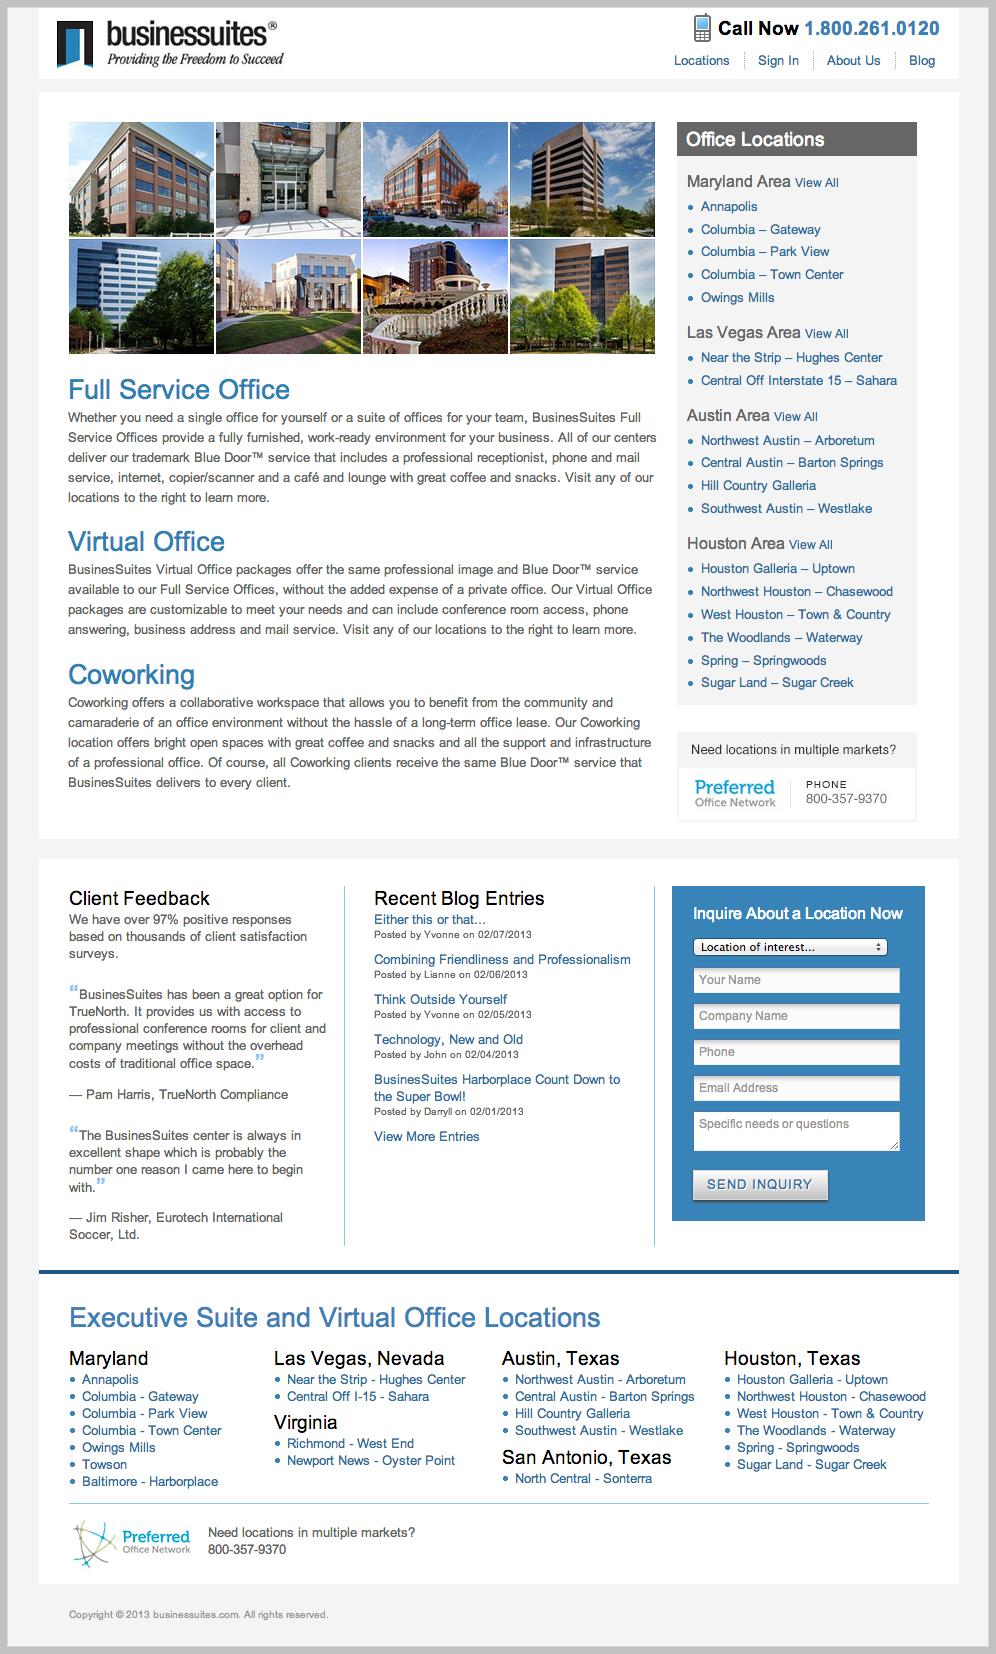 Businessuites Website Redesign On Behance